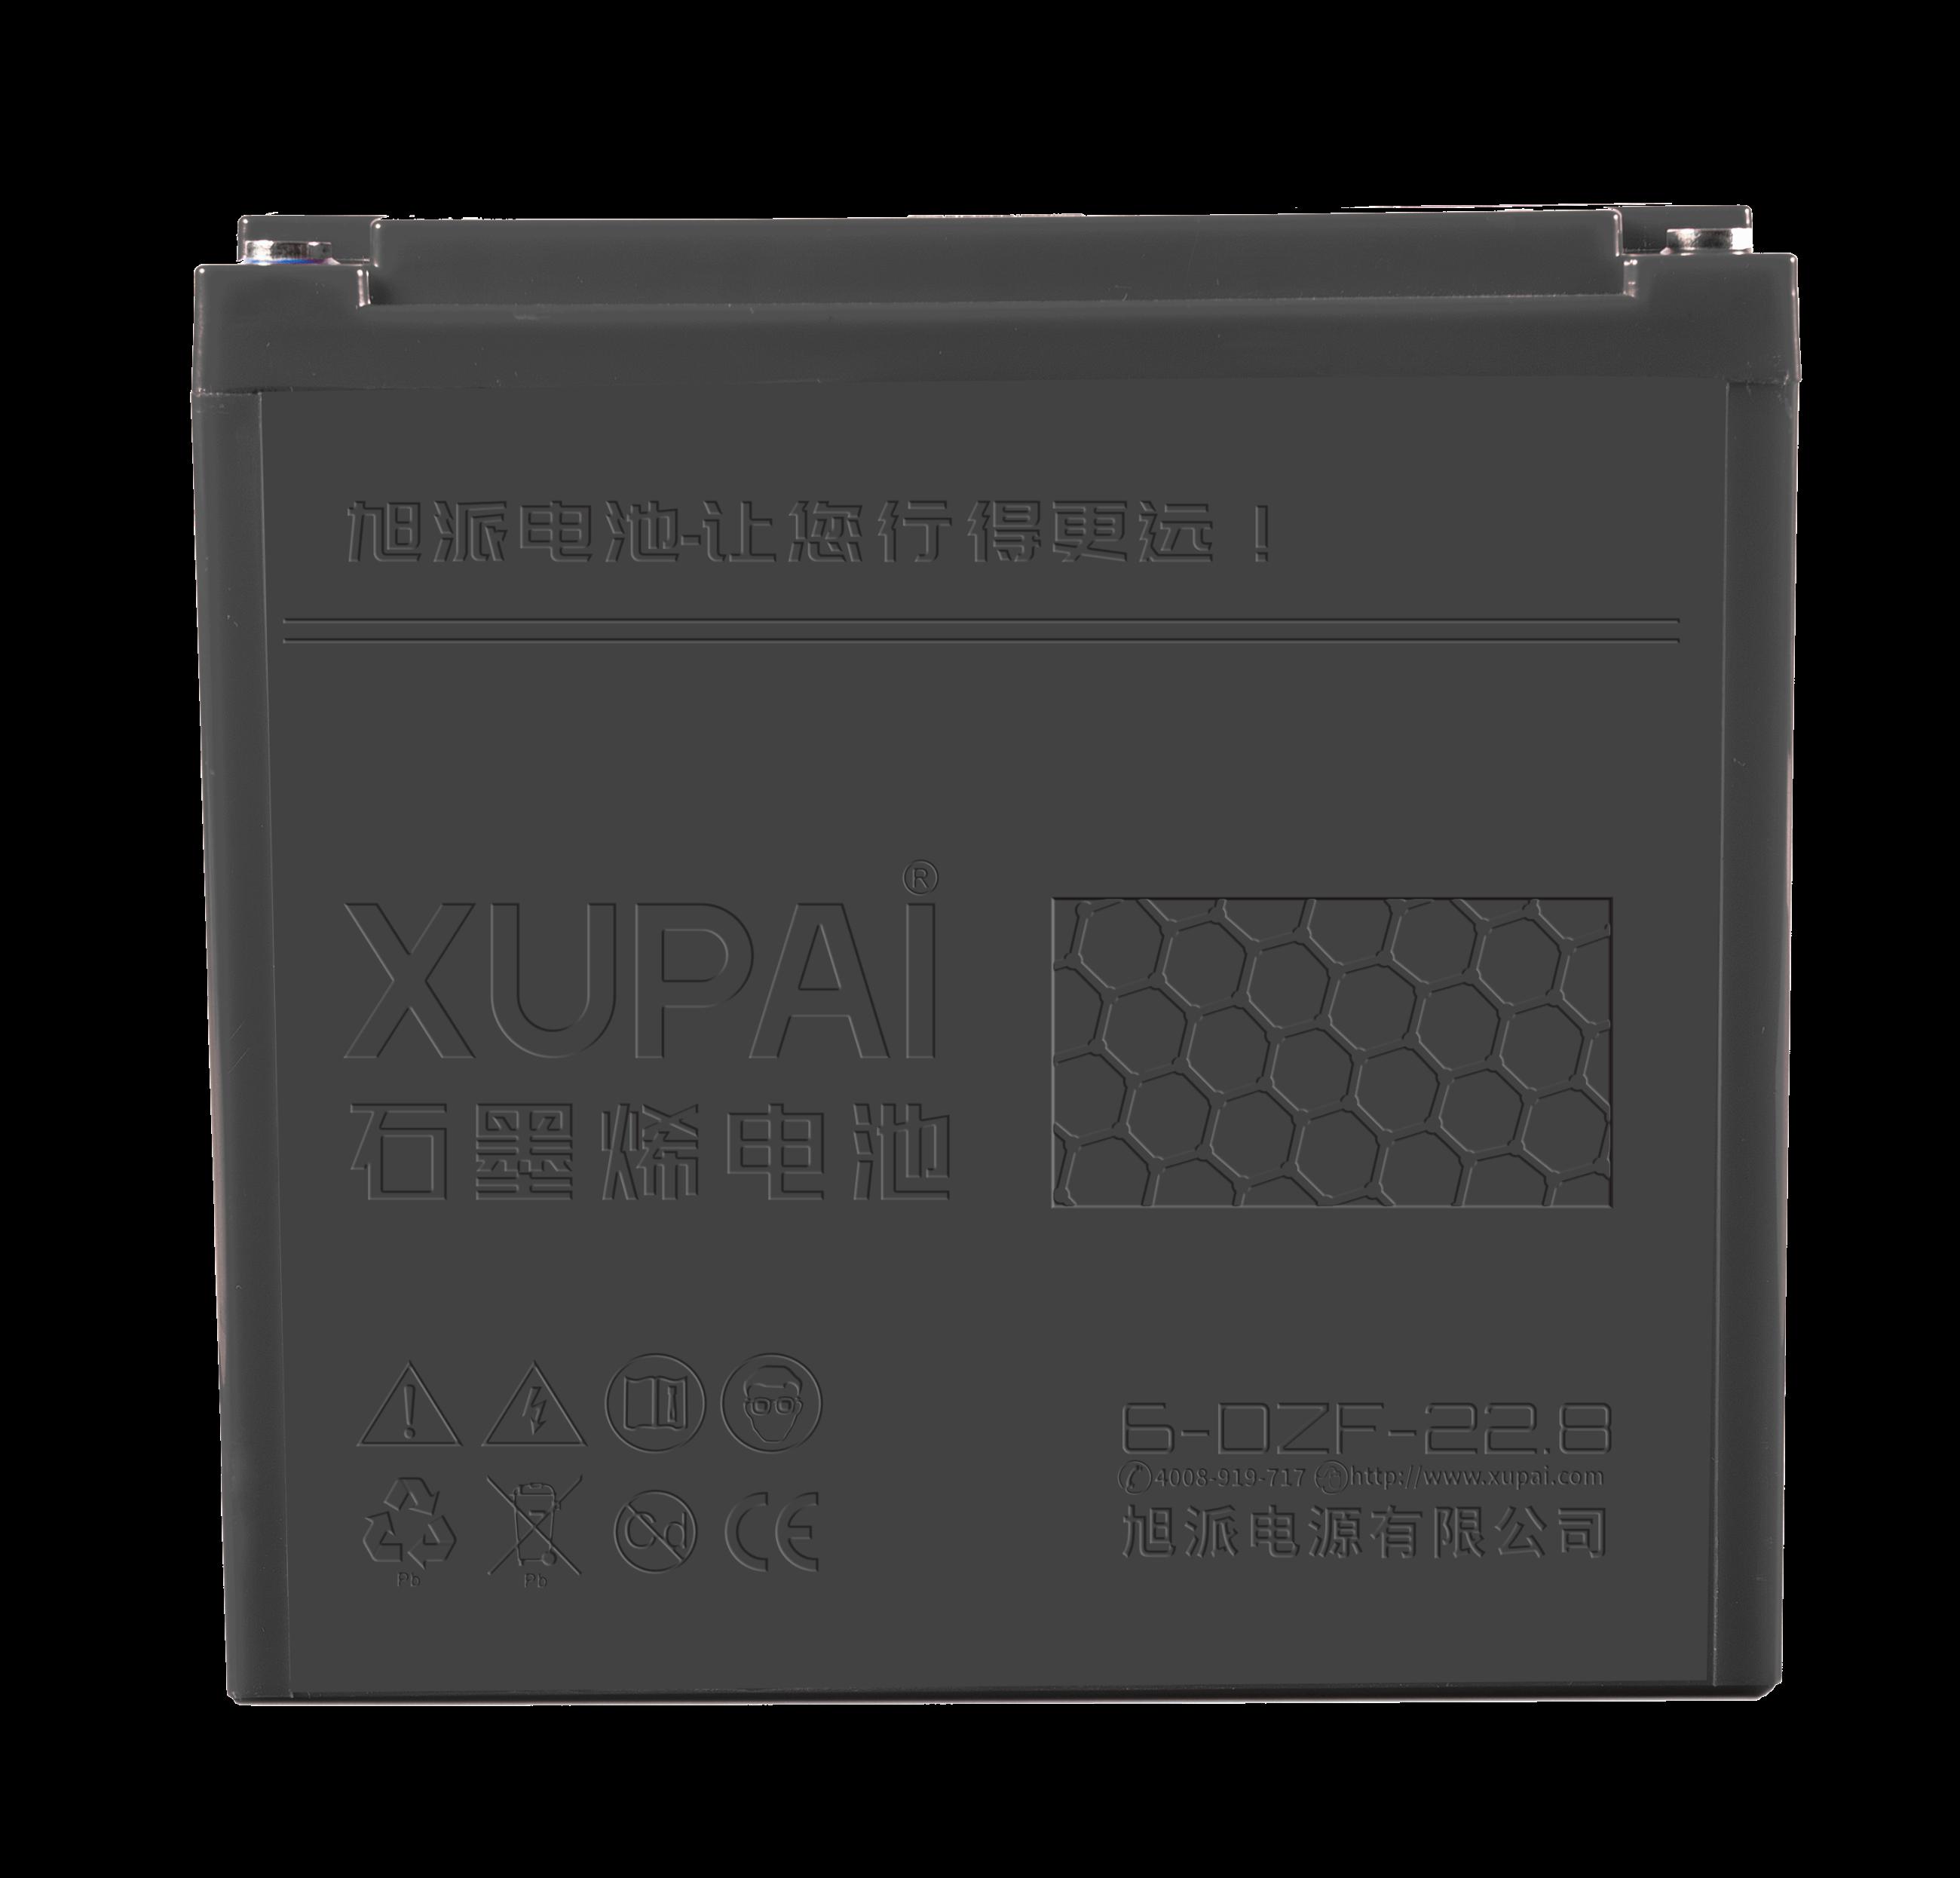 6-DZF-22.8石墨烯电池